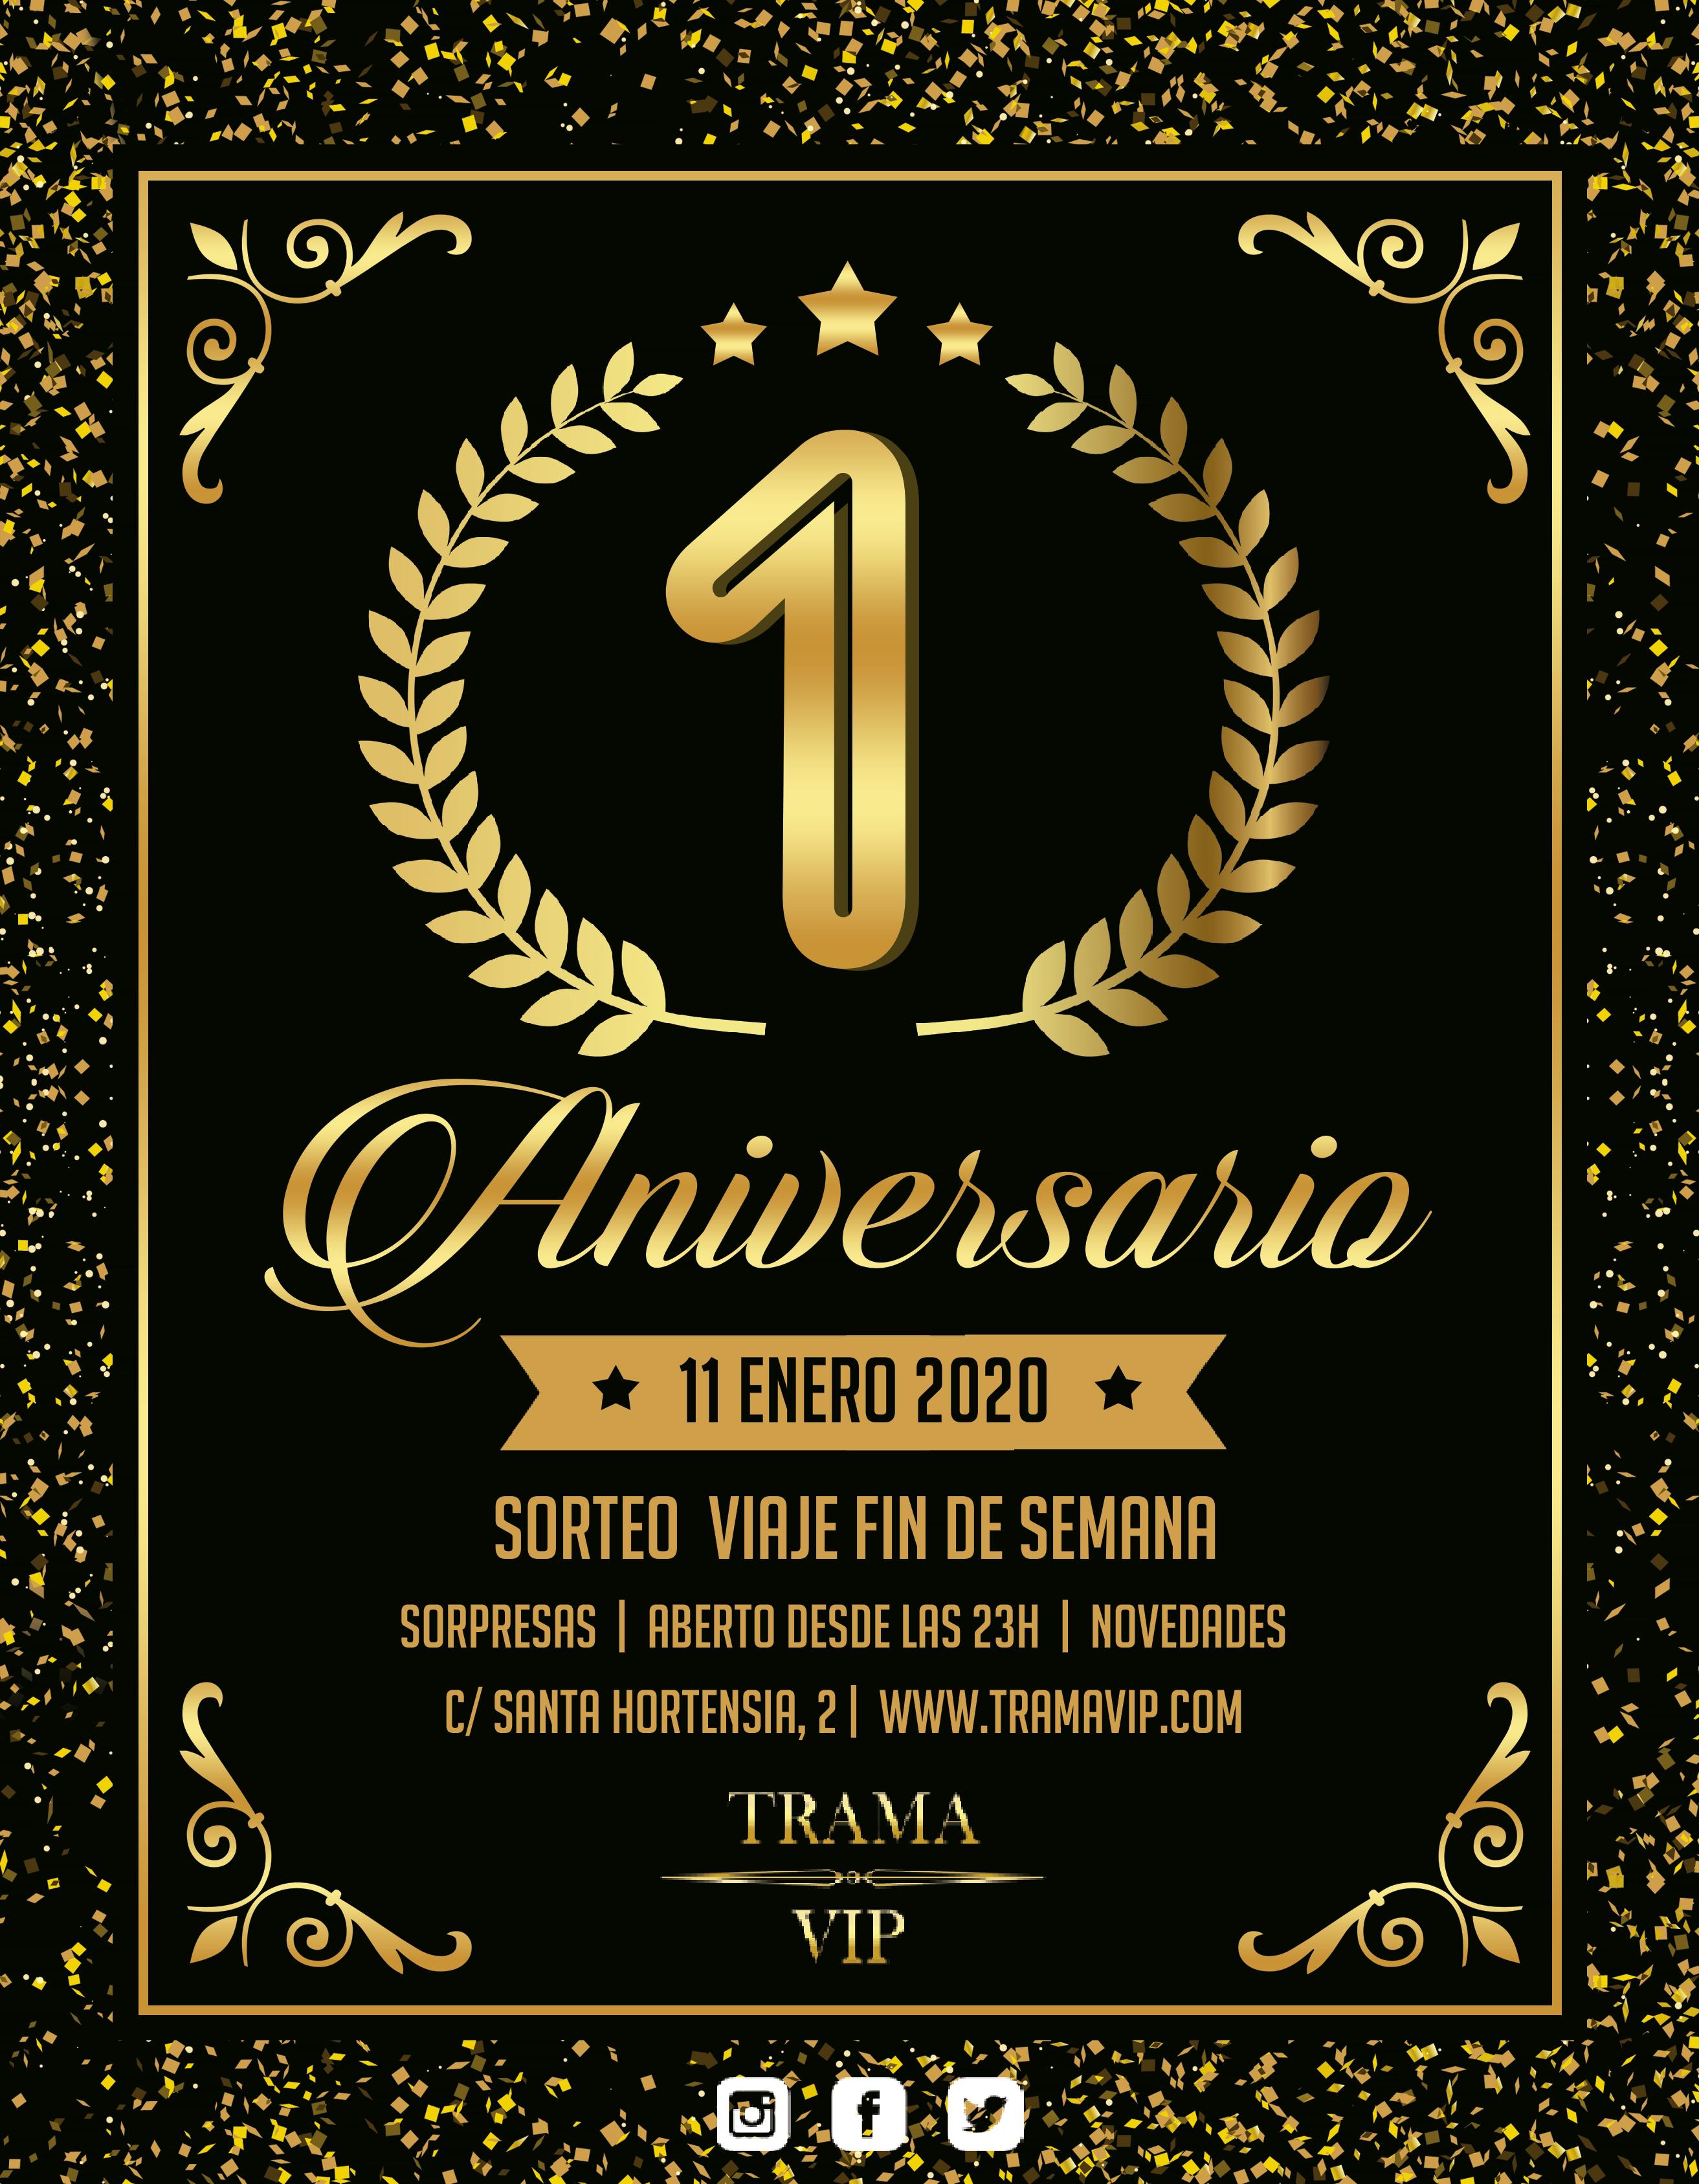 FIESTA DE ANIVERSARIO TRAMA VIP (local swinger Madrid)